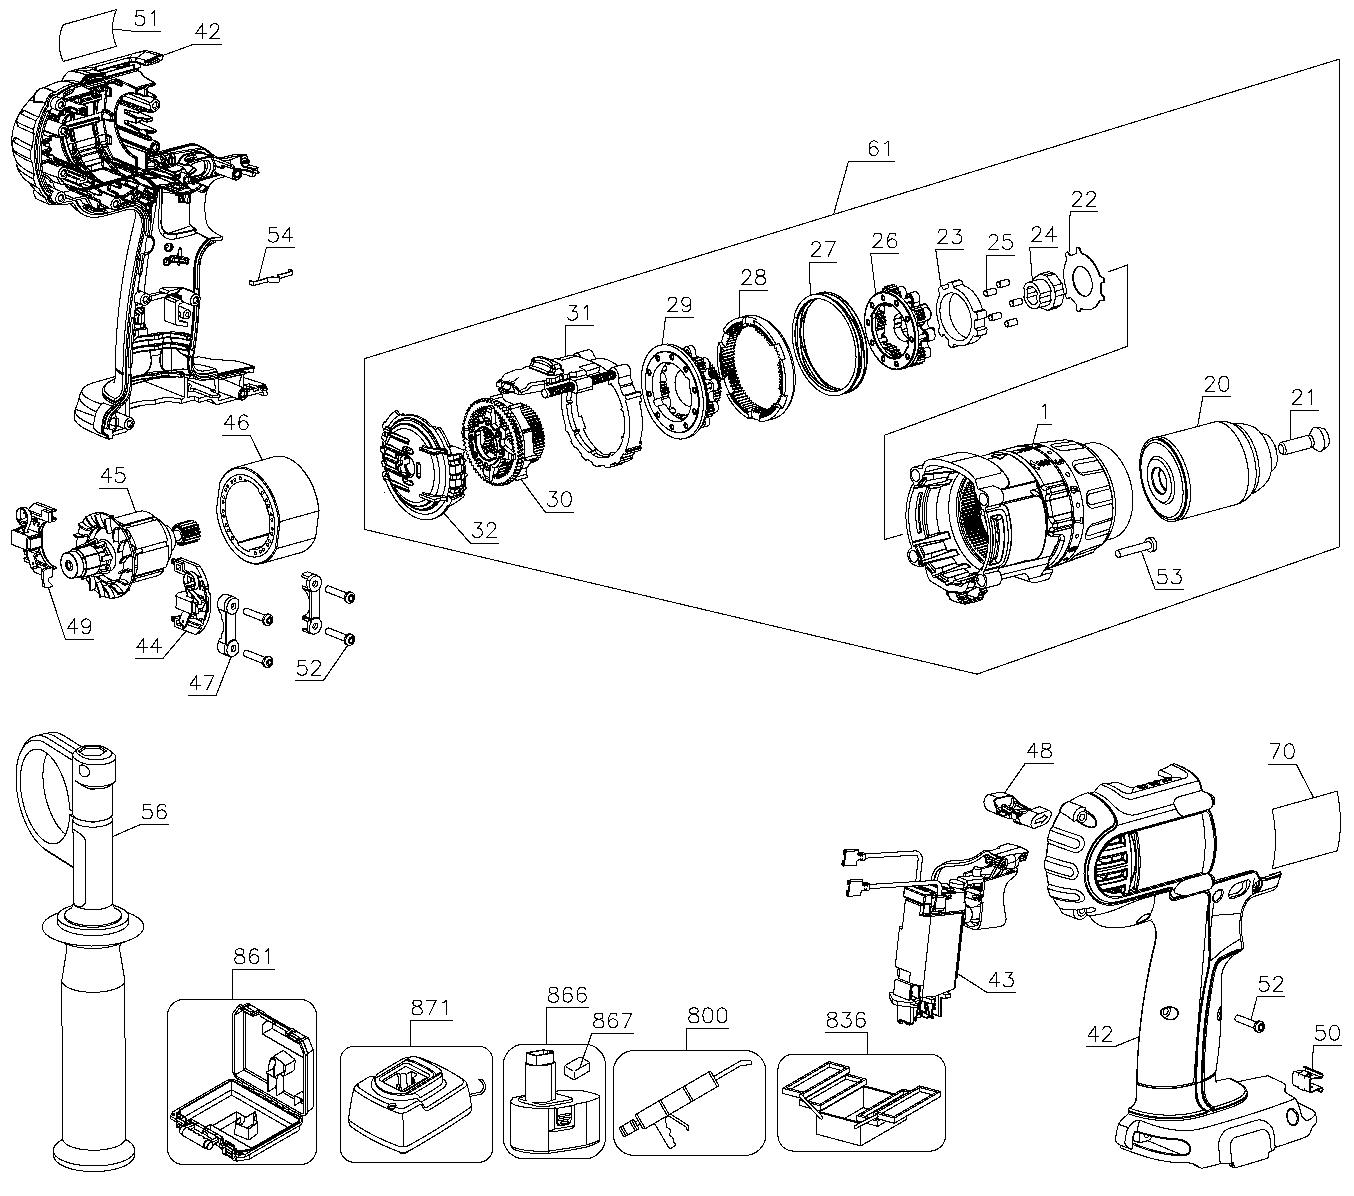 [DIAGRAM_1JK]  EV_0879] De Walt Power Tool Wiring Diagrams Schematic Wiring | De Walt Power Tool Wiring Diagrams |  | None Inki Isra Mohammedshrine Librar Wiring 101